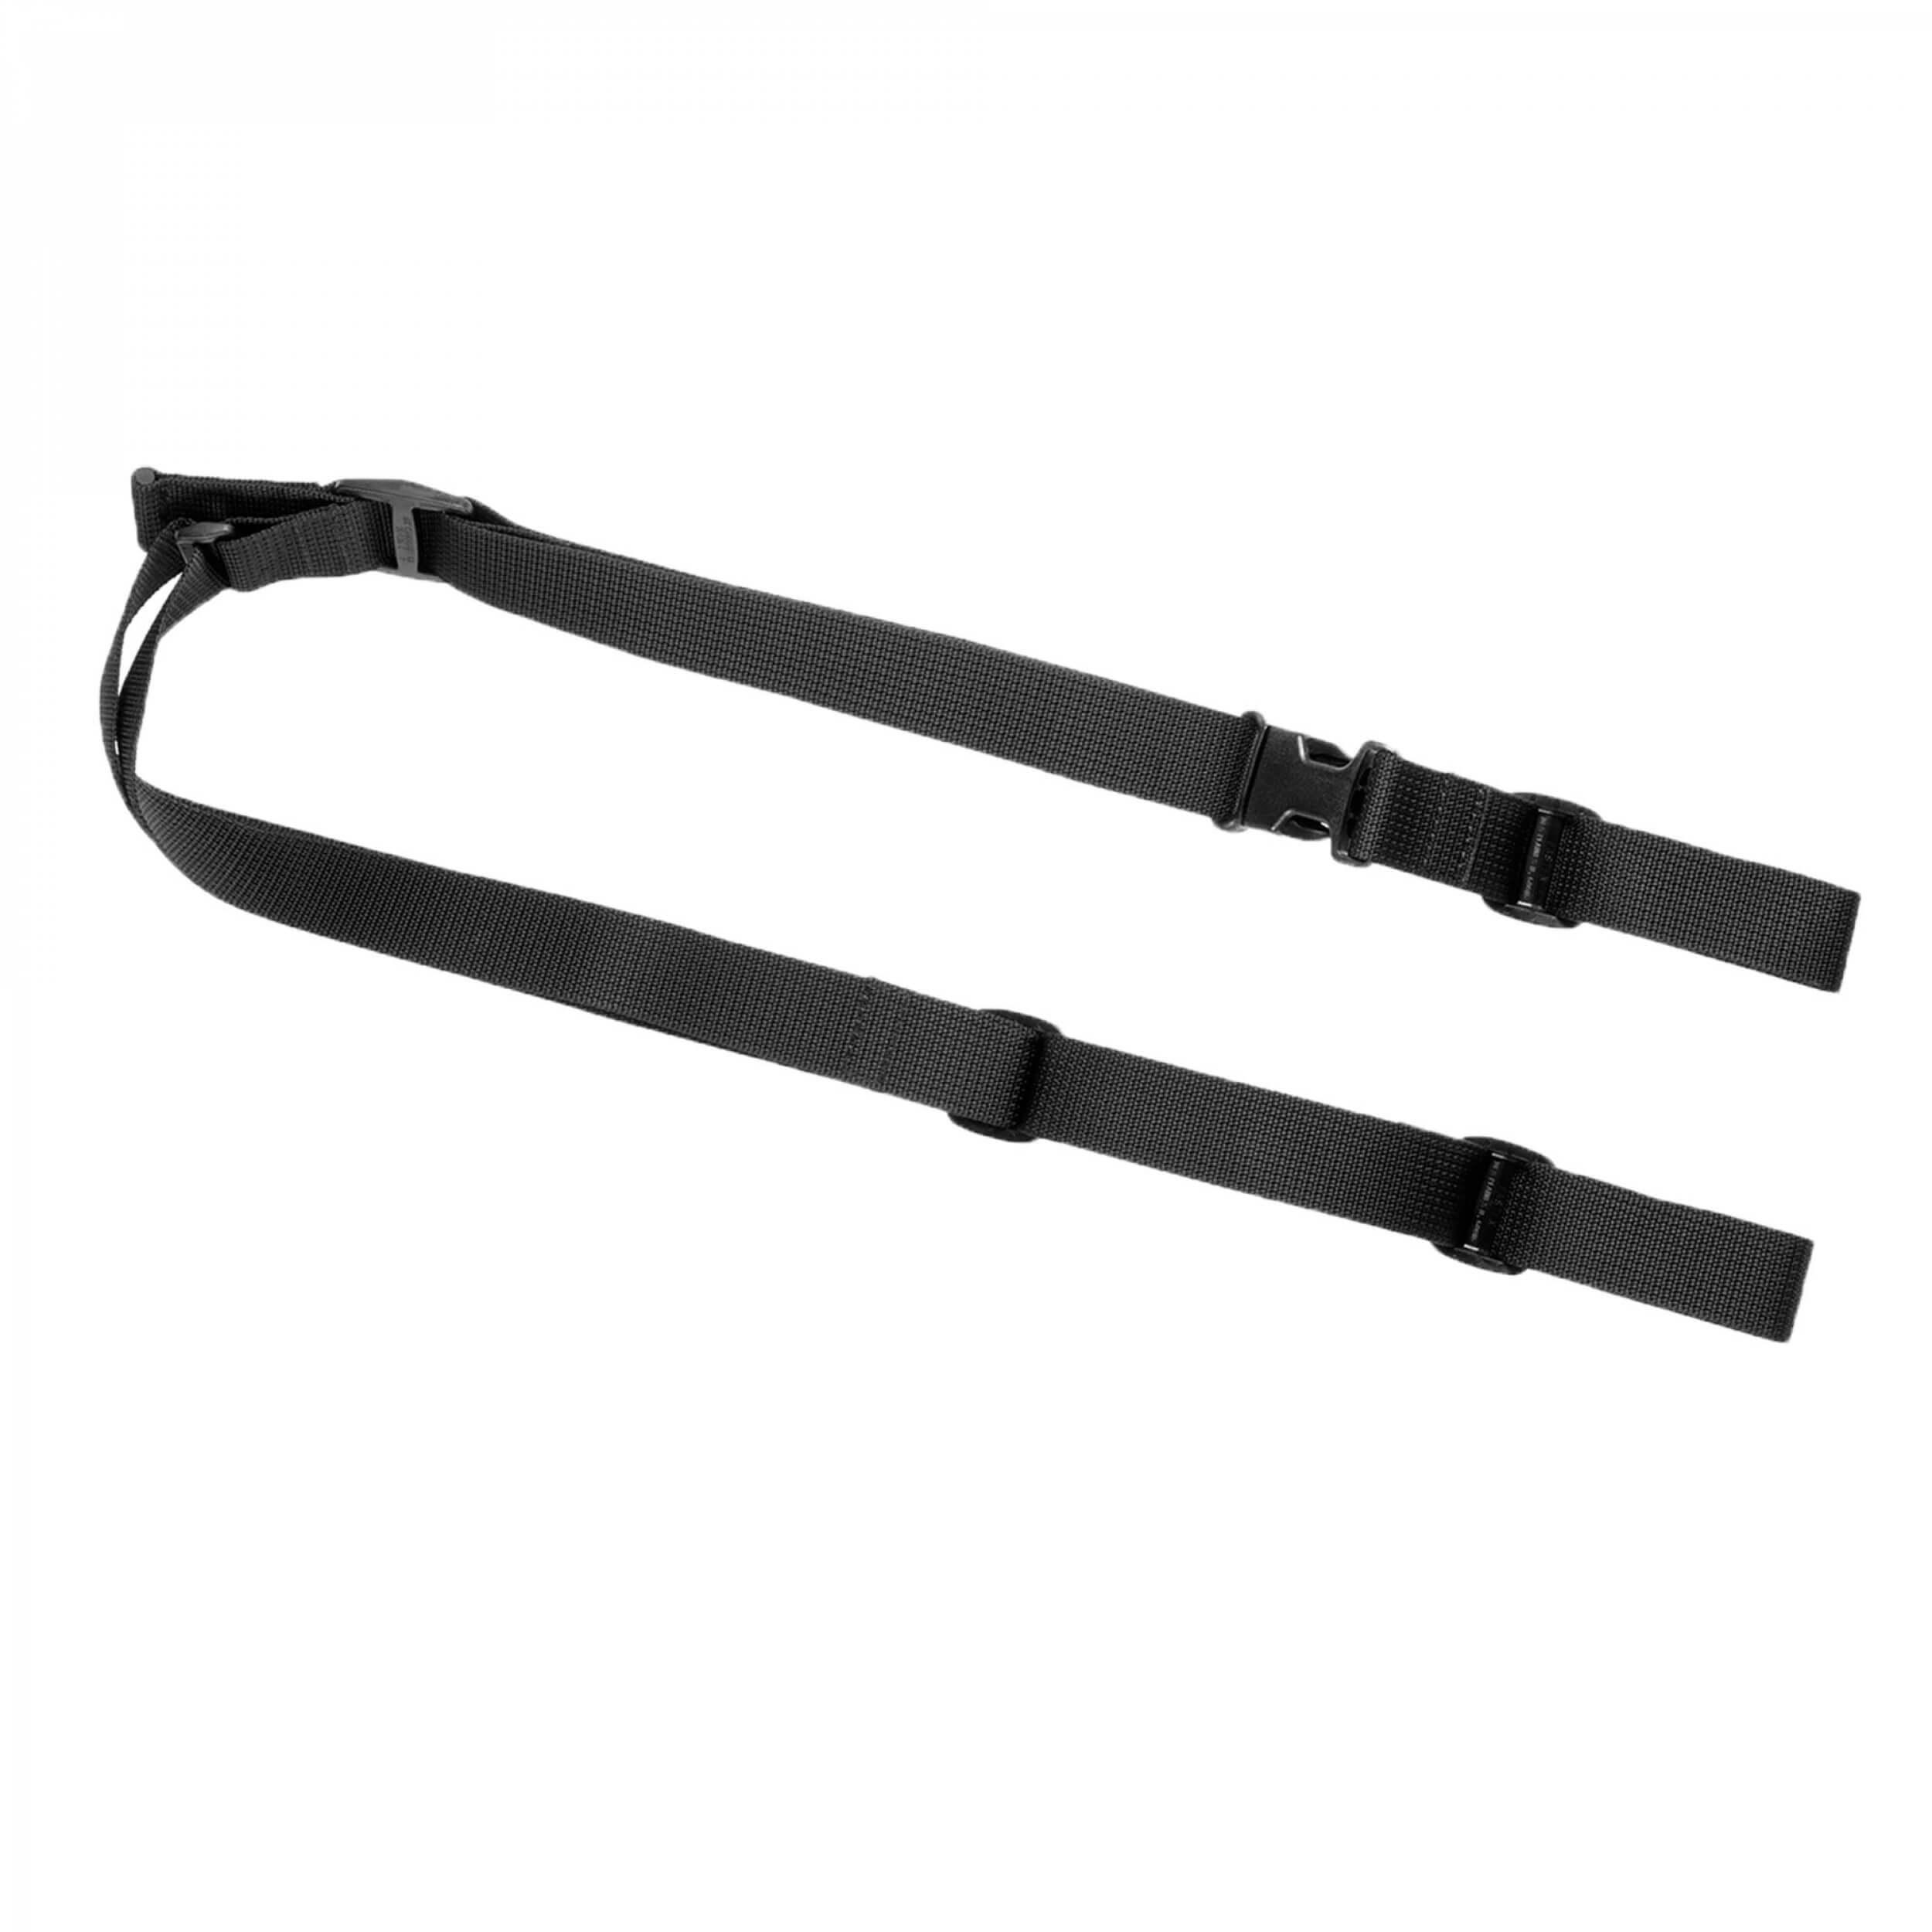 Clawgear QA Two Point Sling Loop (Gewehrriemen) - Schwarz